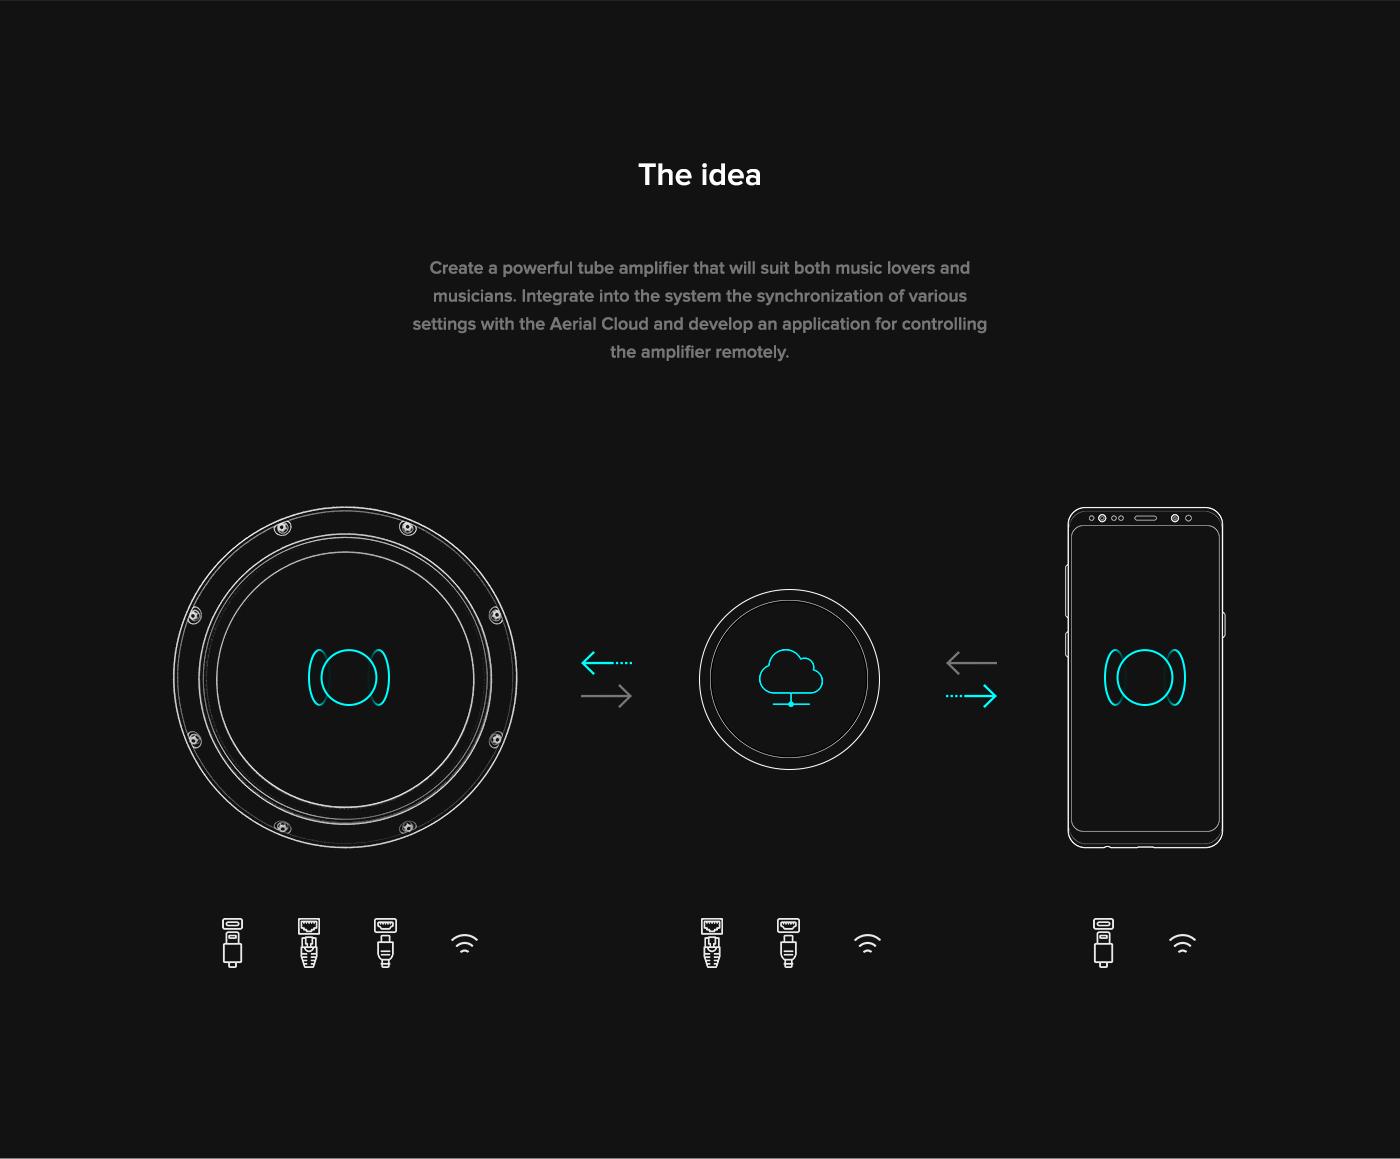 industrial design  Interaction design  ui ux iphonex application amplifier music Interface device sound